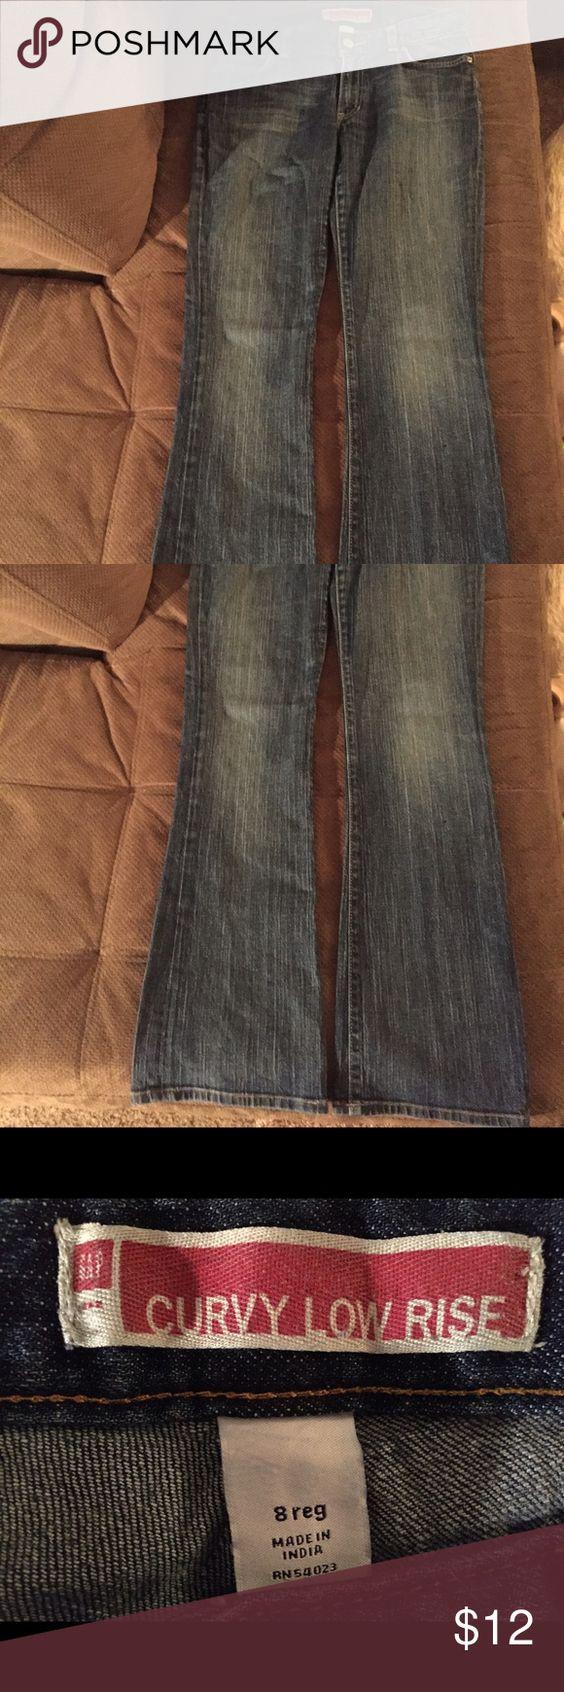 Gap curvy low rise jeans Gap curvy low rise jeans GAP Jeans Boyfriend